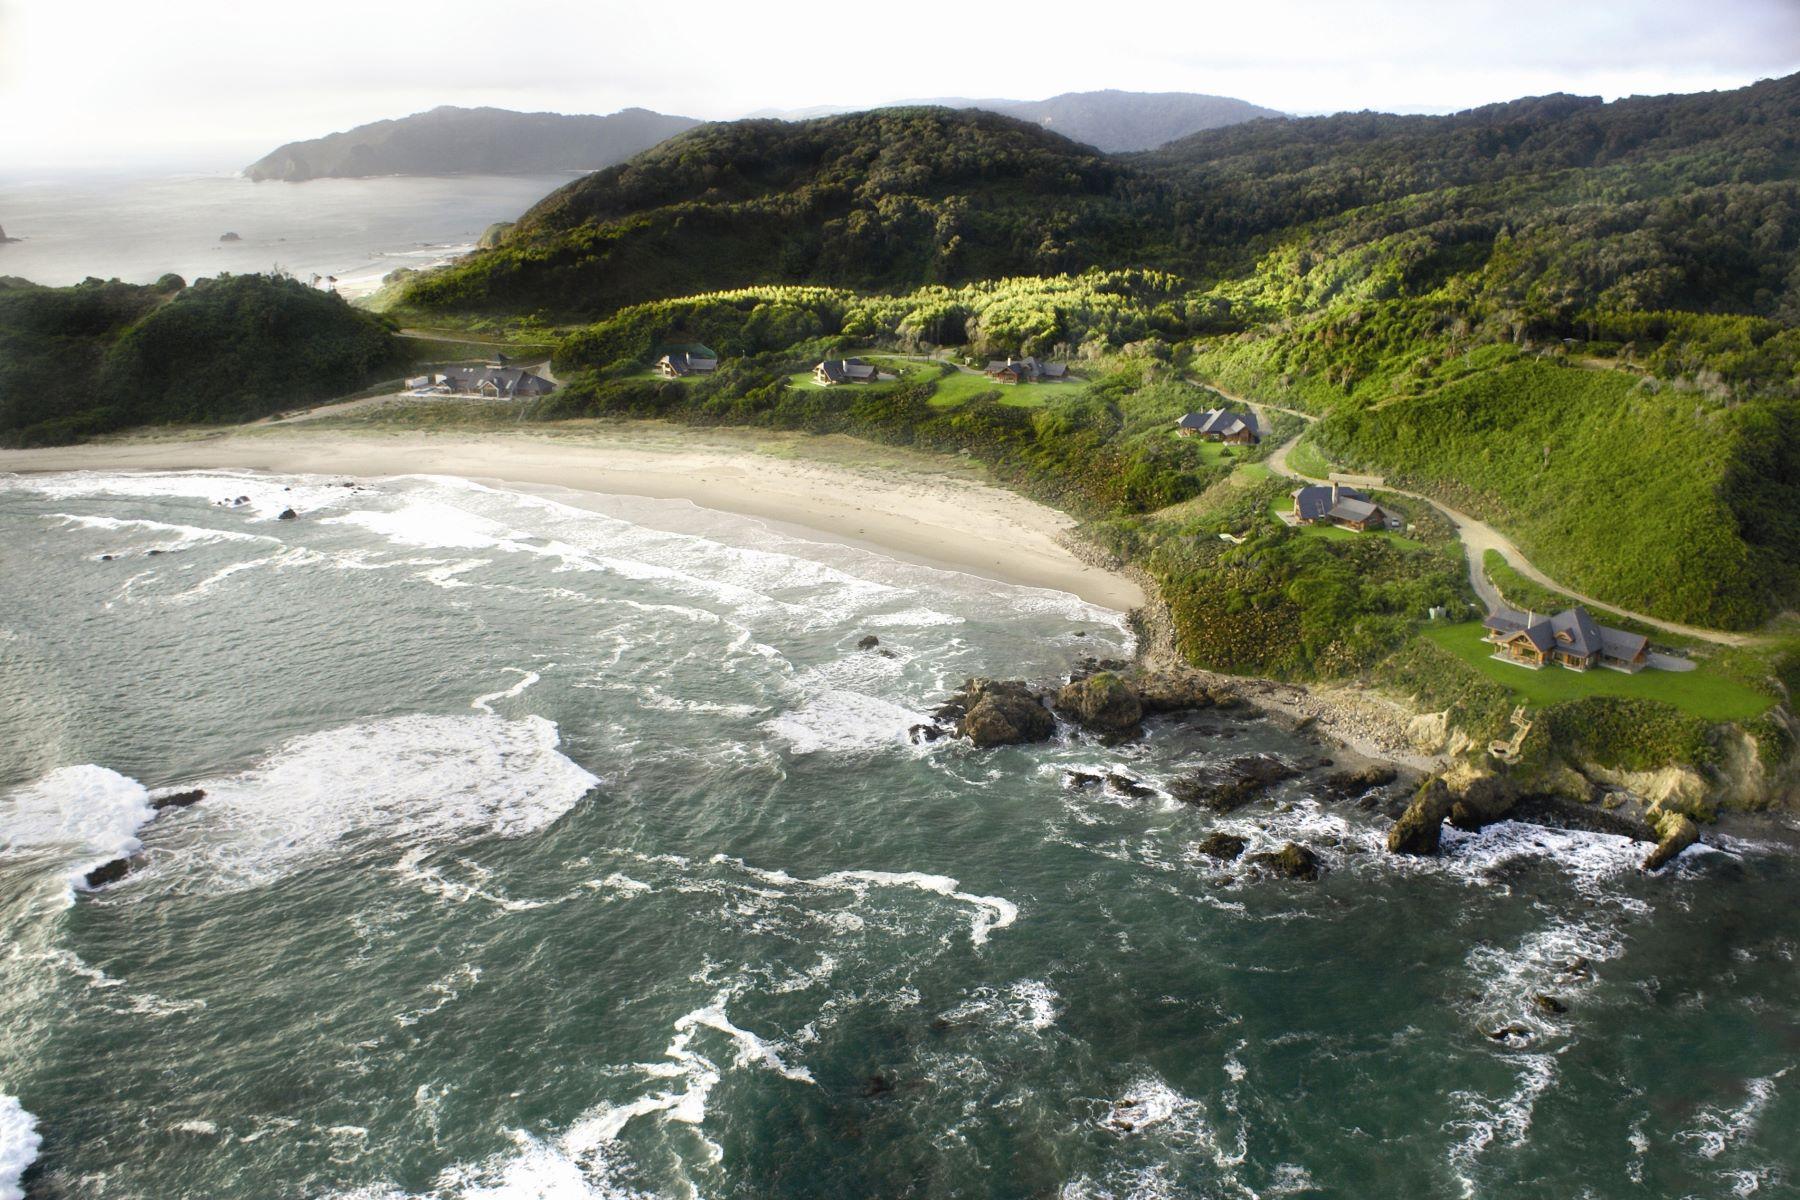 农场 / 牧场 / 种植园 为 销售 在 The Cliffs Preserve - Eco Luxury Paradise Los Muermos, Puerto Montt, Los Lagos 智利